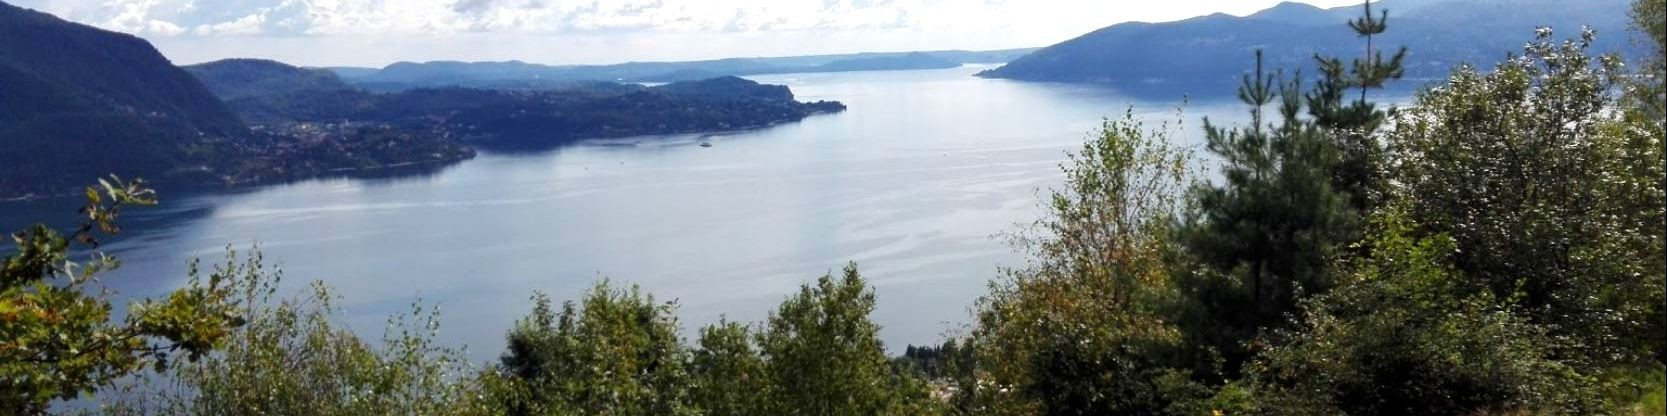 Premeno, výhled na jezero